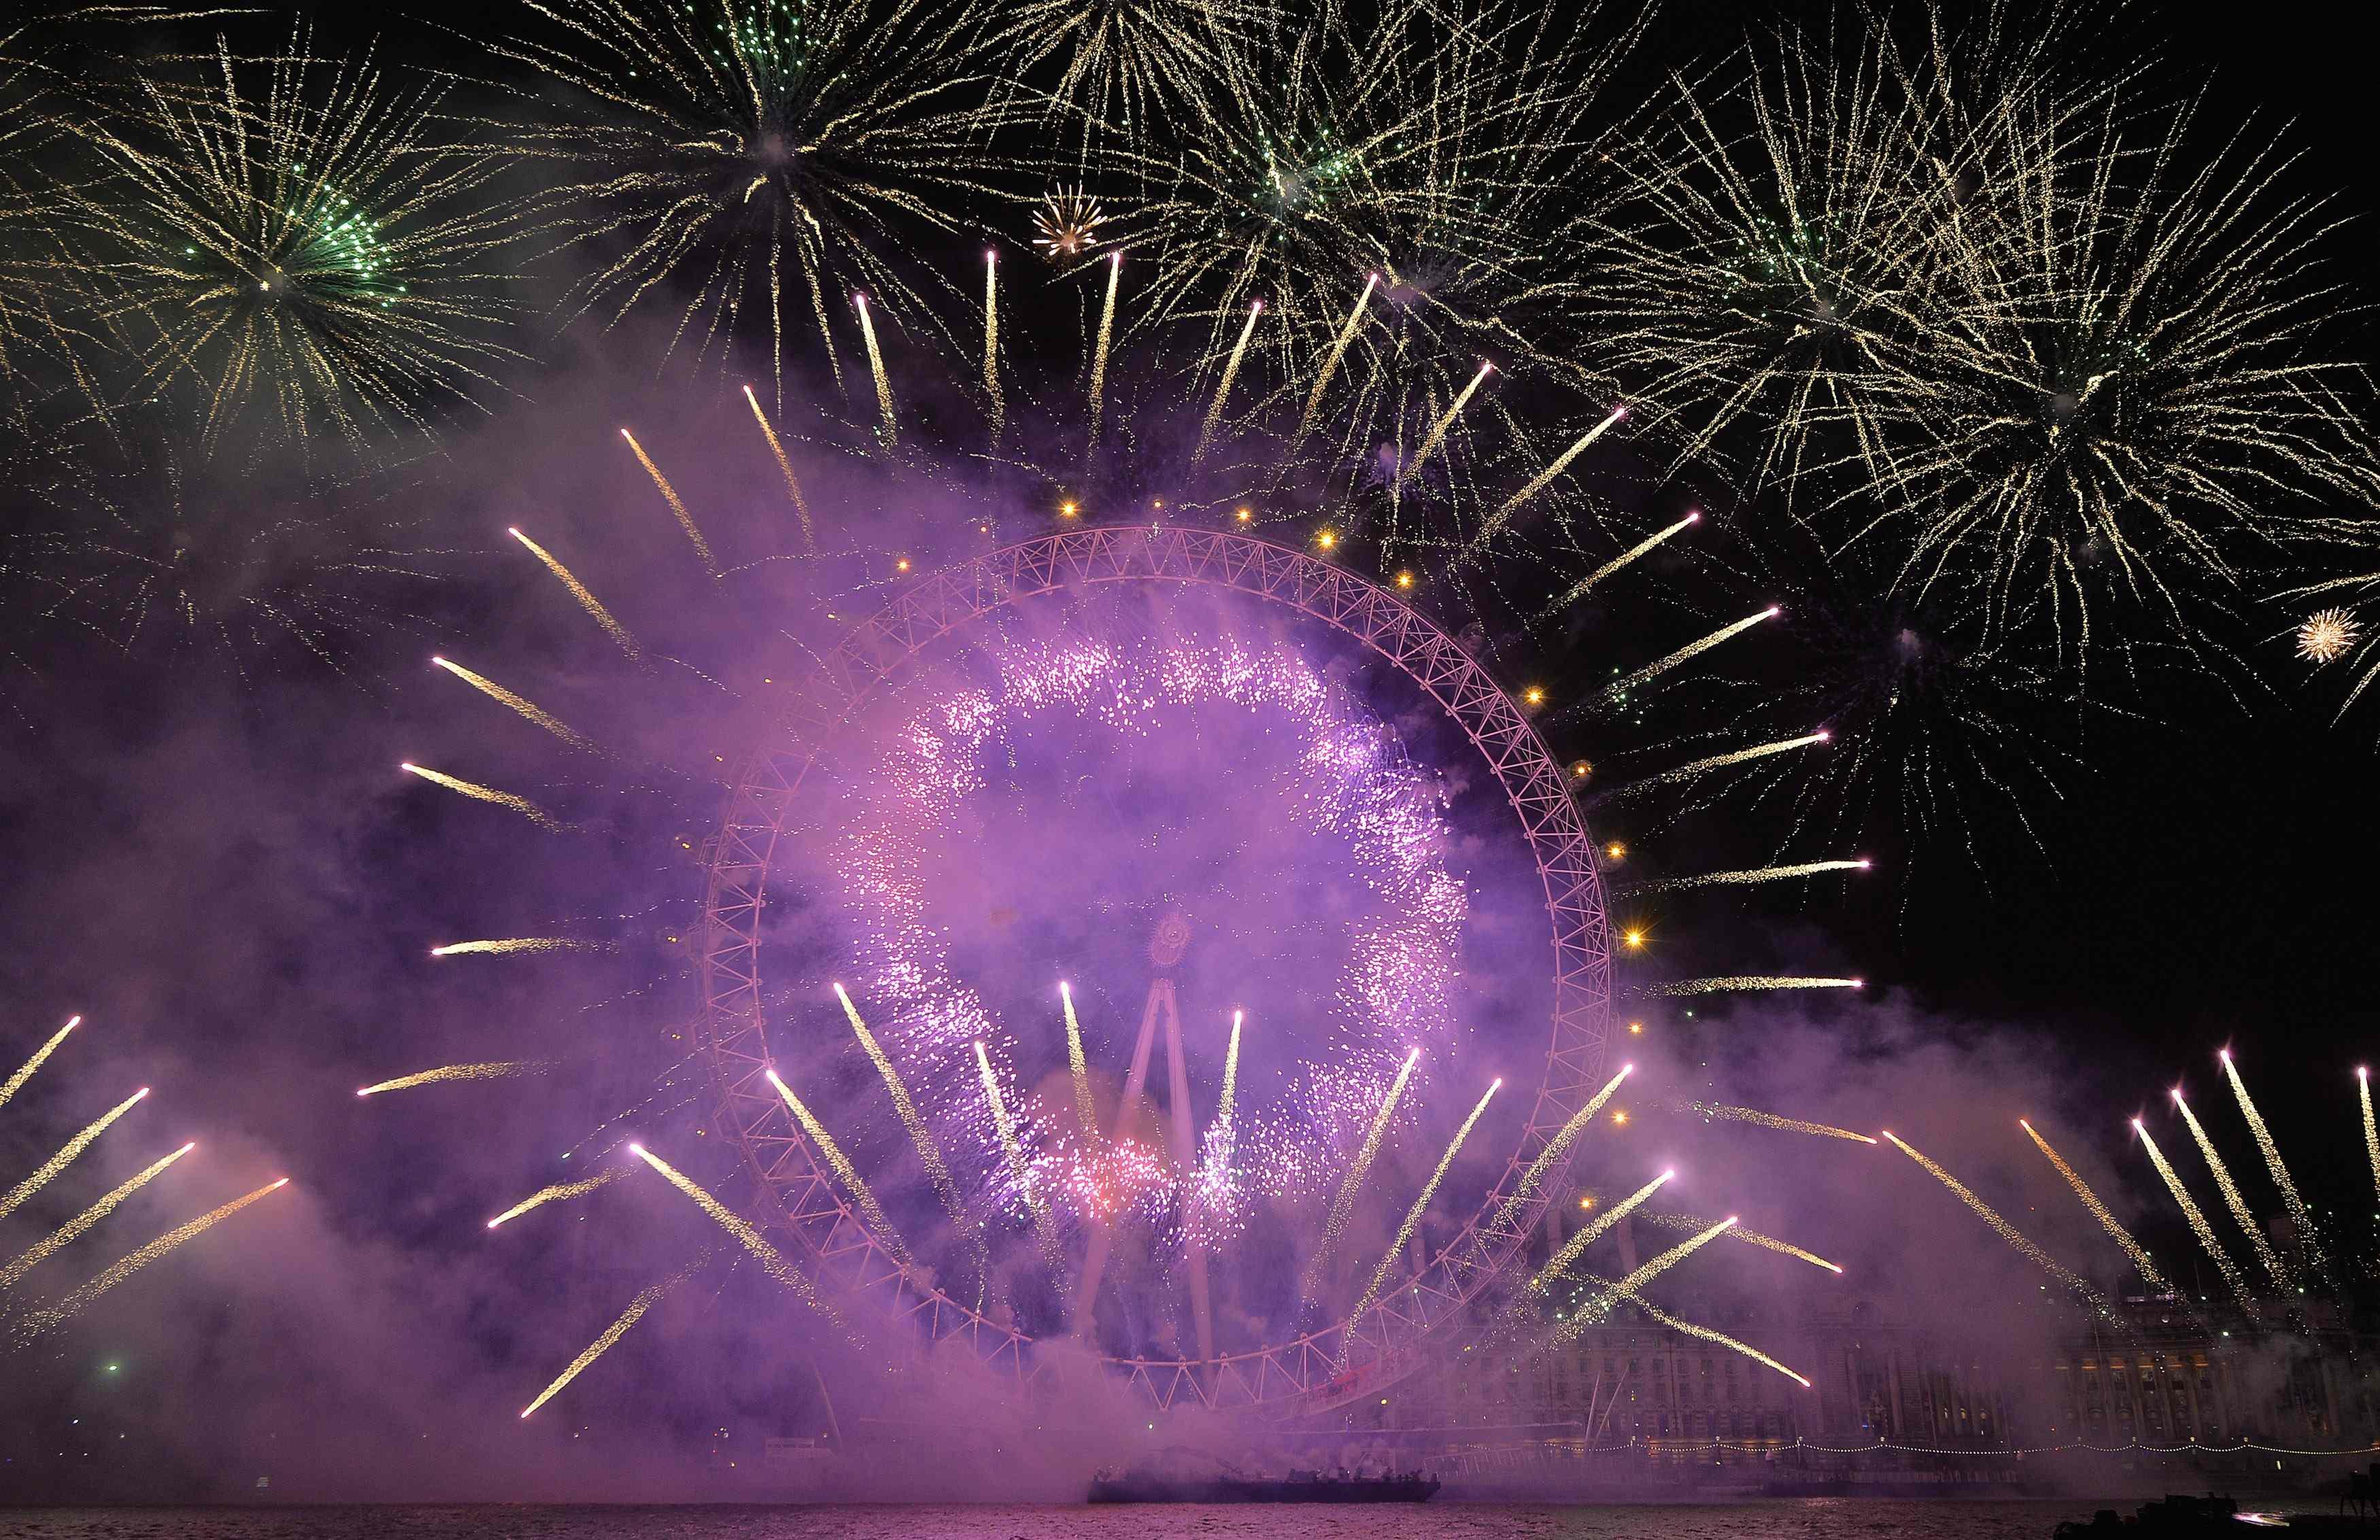 Fireworks explode in central London